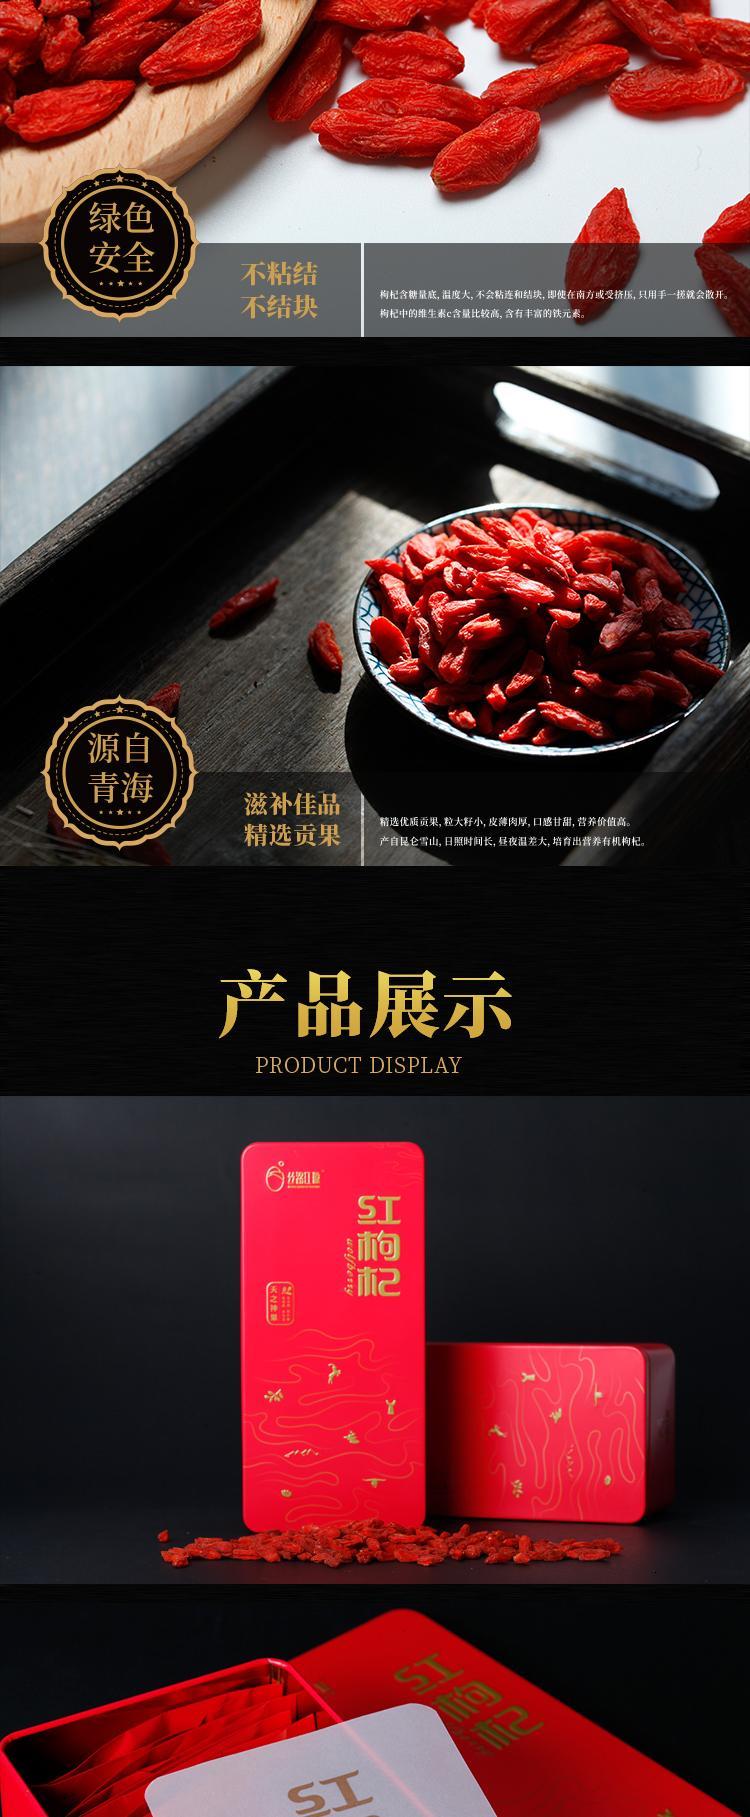 http://xinslu.com/attachment/images/3/2019/07/BCAMbohlfV6kK06mAme8VimV0KloCE.jpg